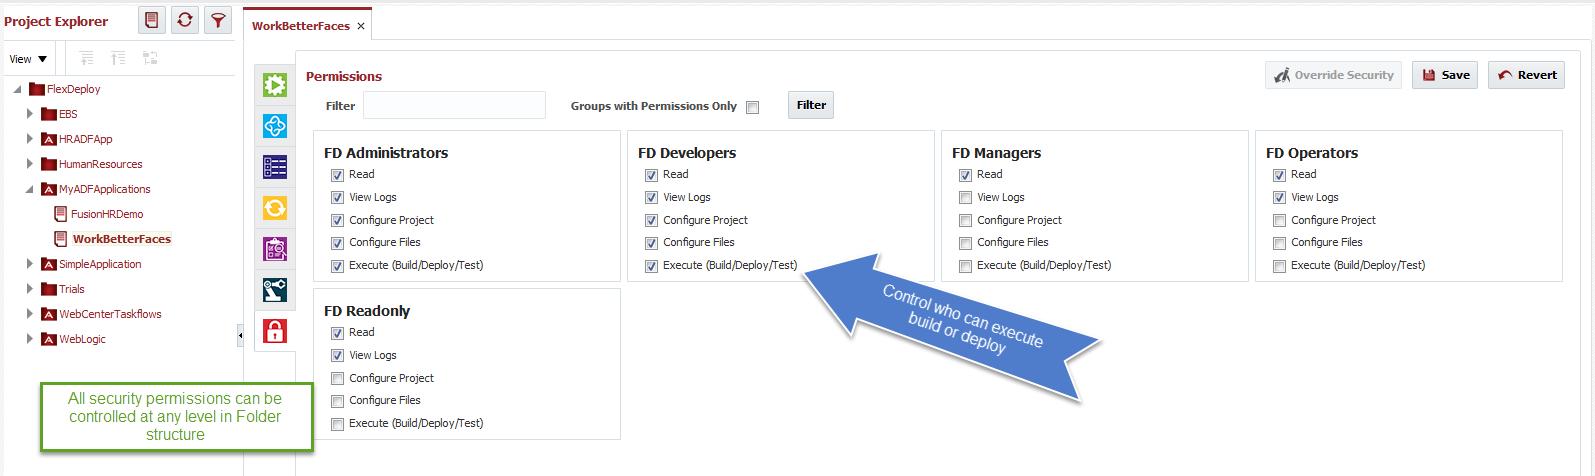 deploy_perm_folder_permissions